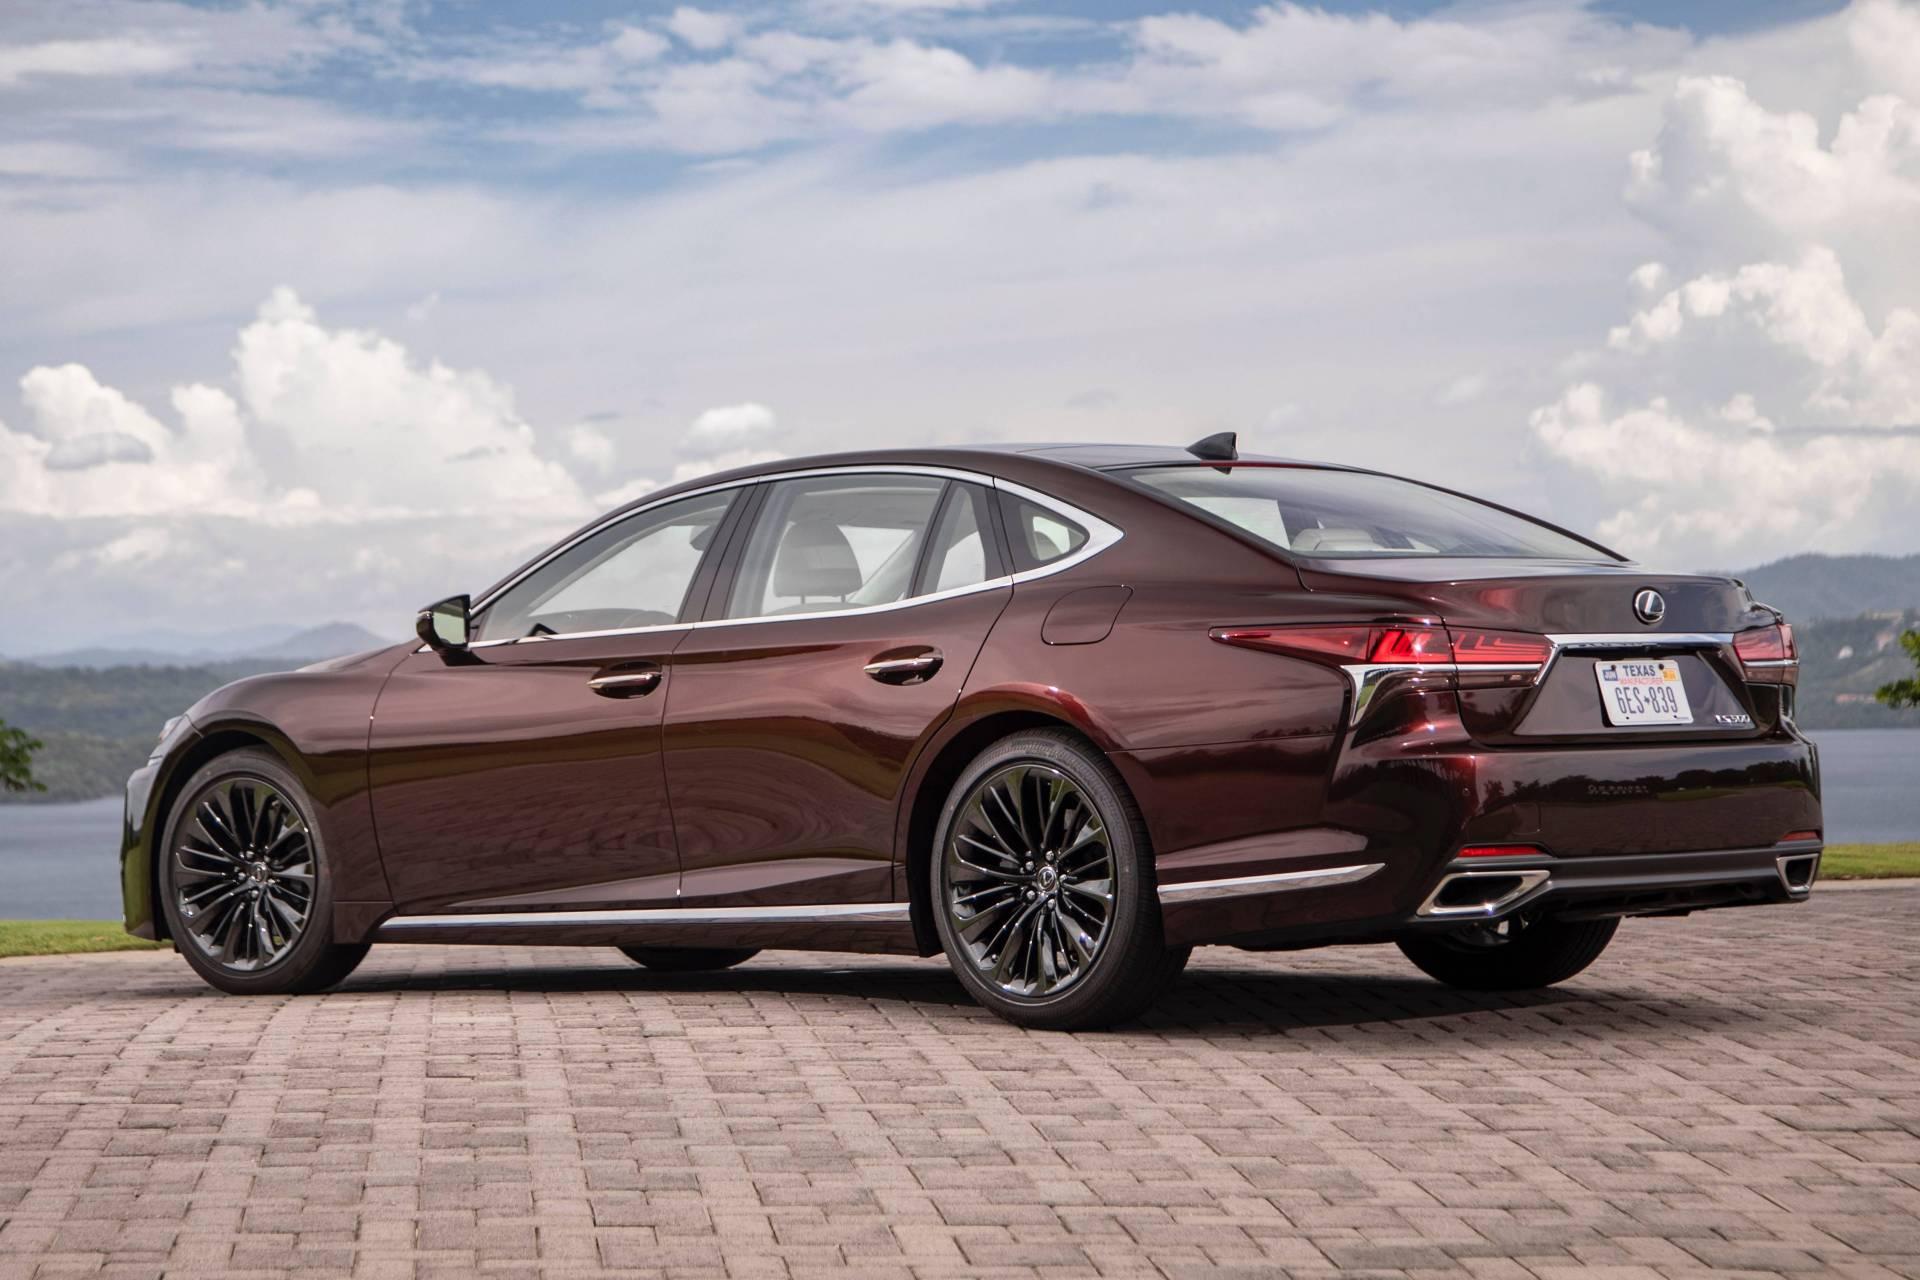 Lexus-LS-500-Inspiration-Series-4